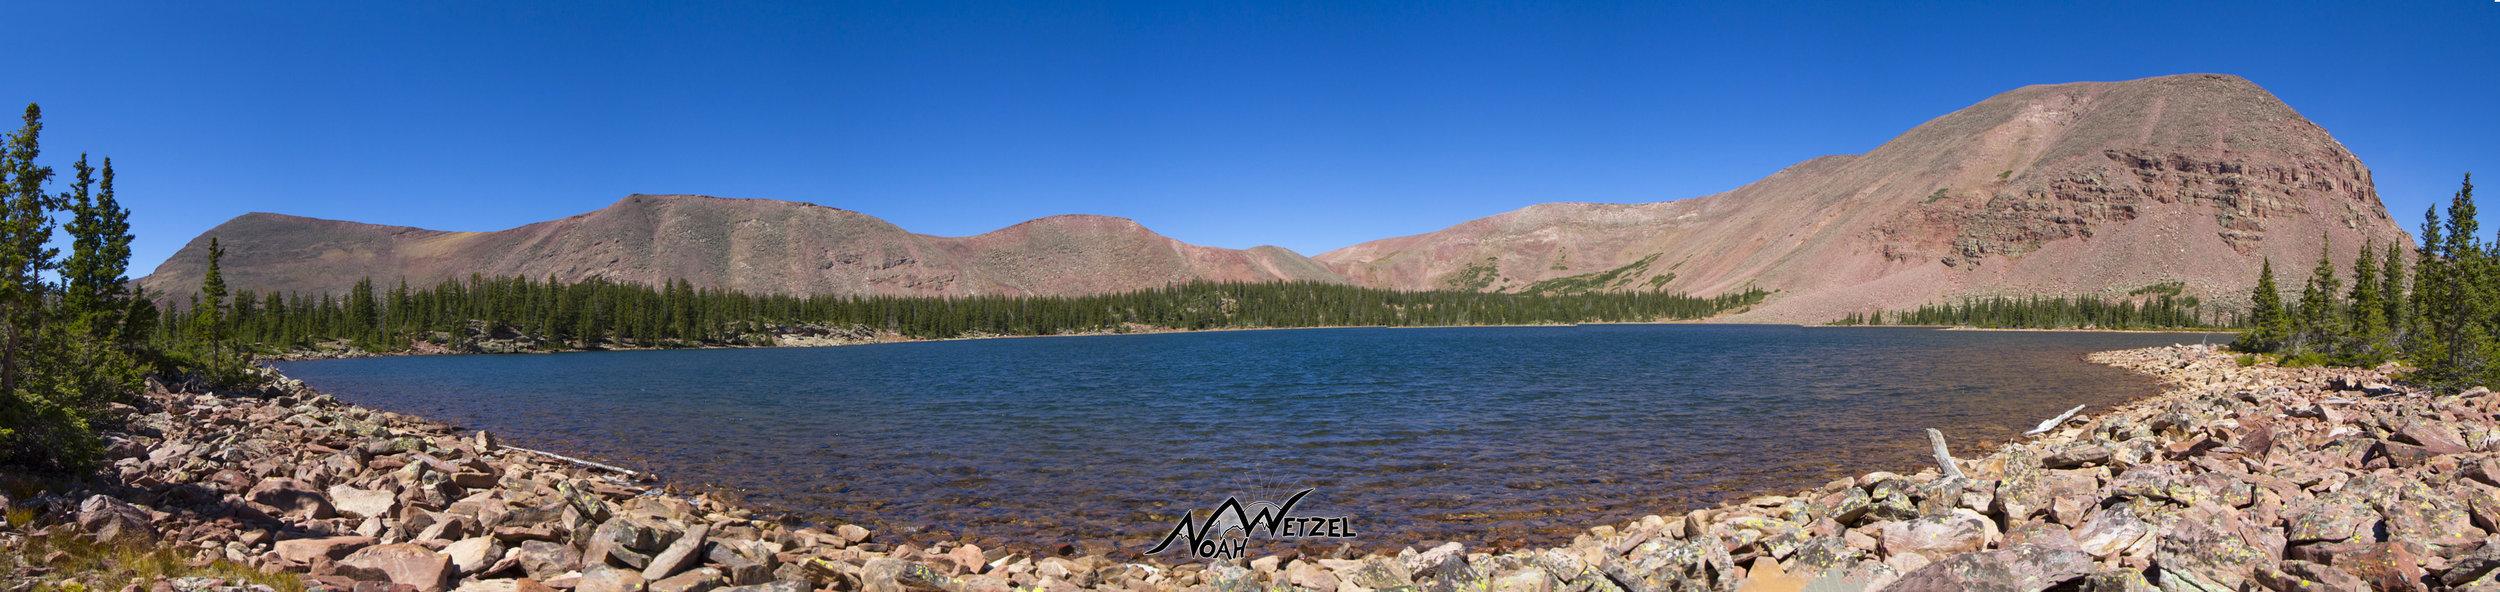 Farmers Lake. Just before reaching Timothy Lakes in the High Uintas Wilderness. Utah.